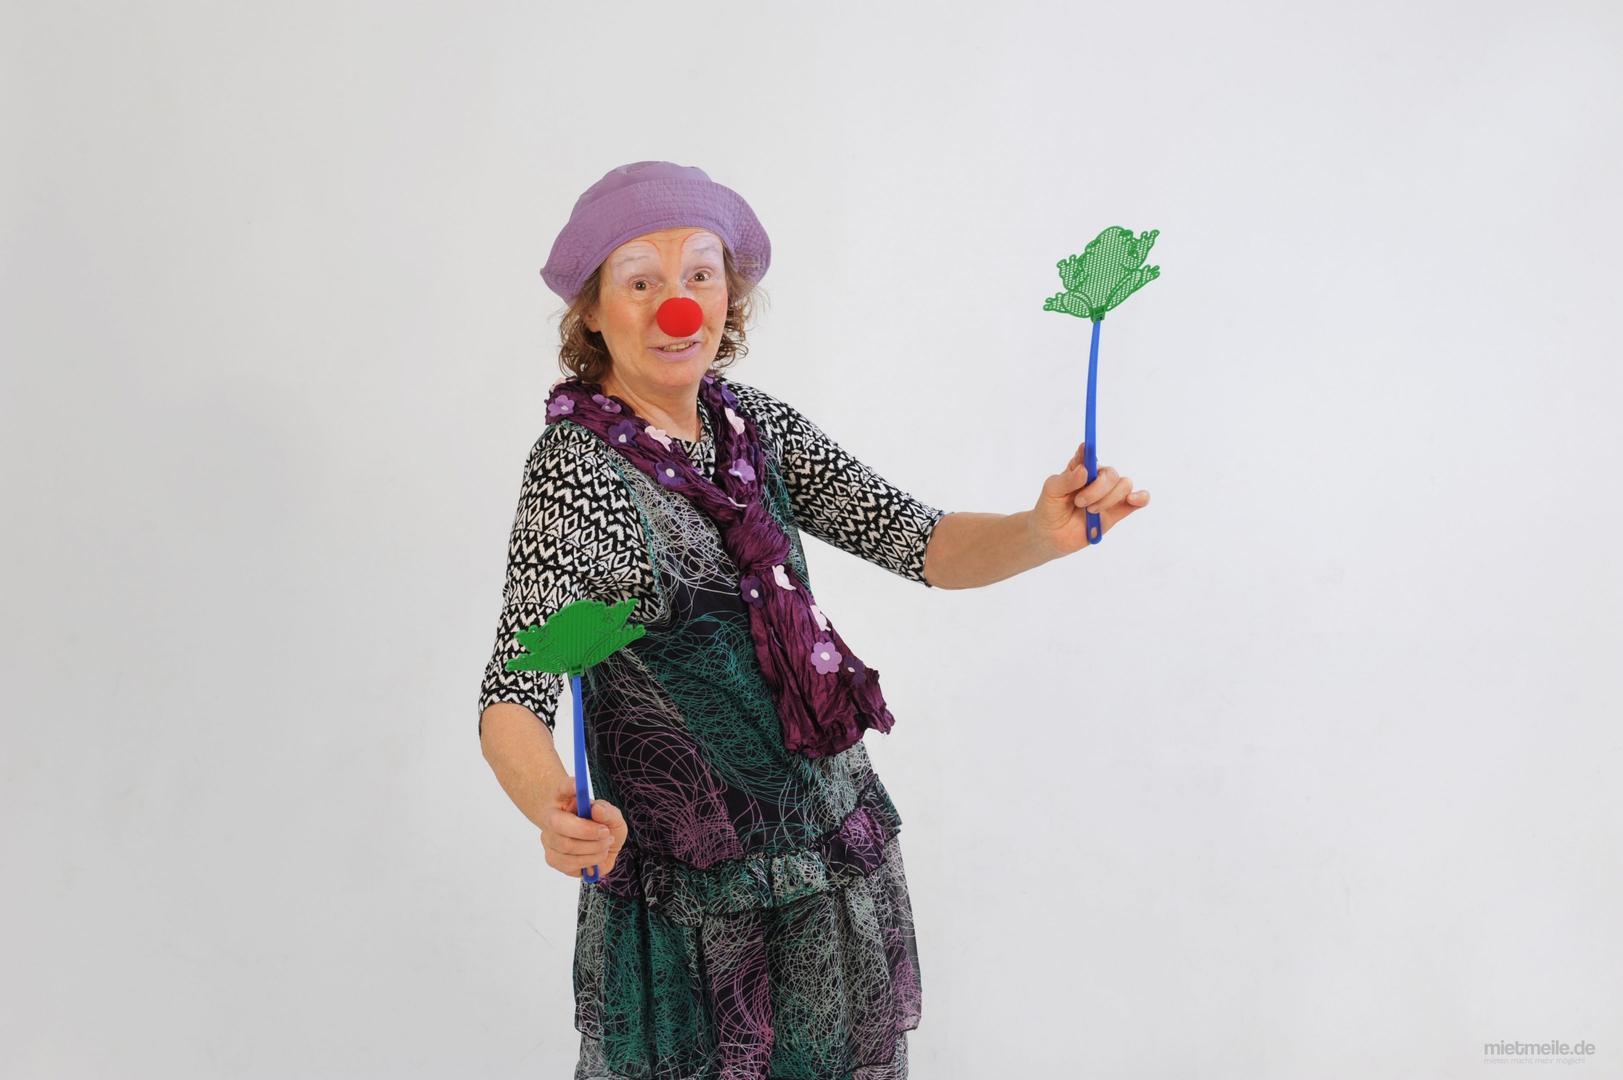 Clown mieten & vermieten - Clown Ulala in München